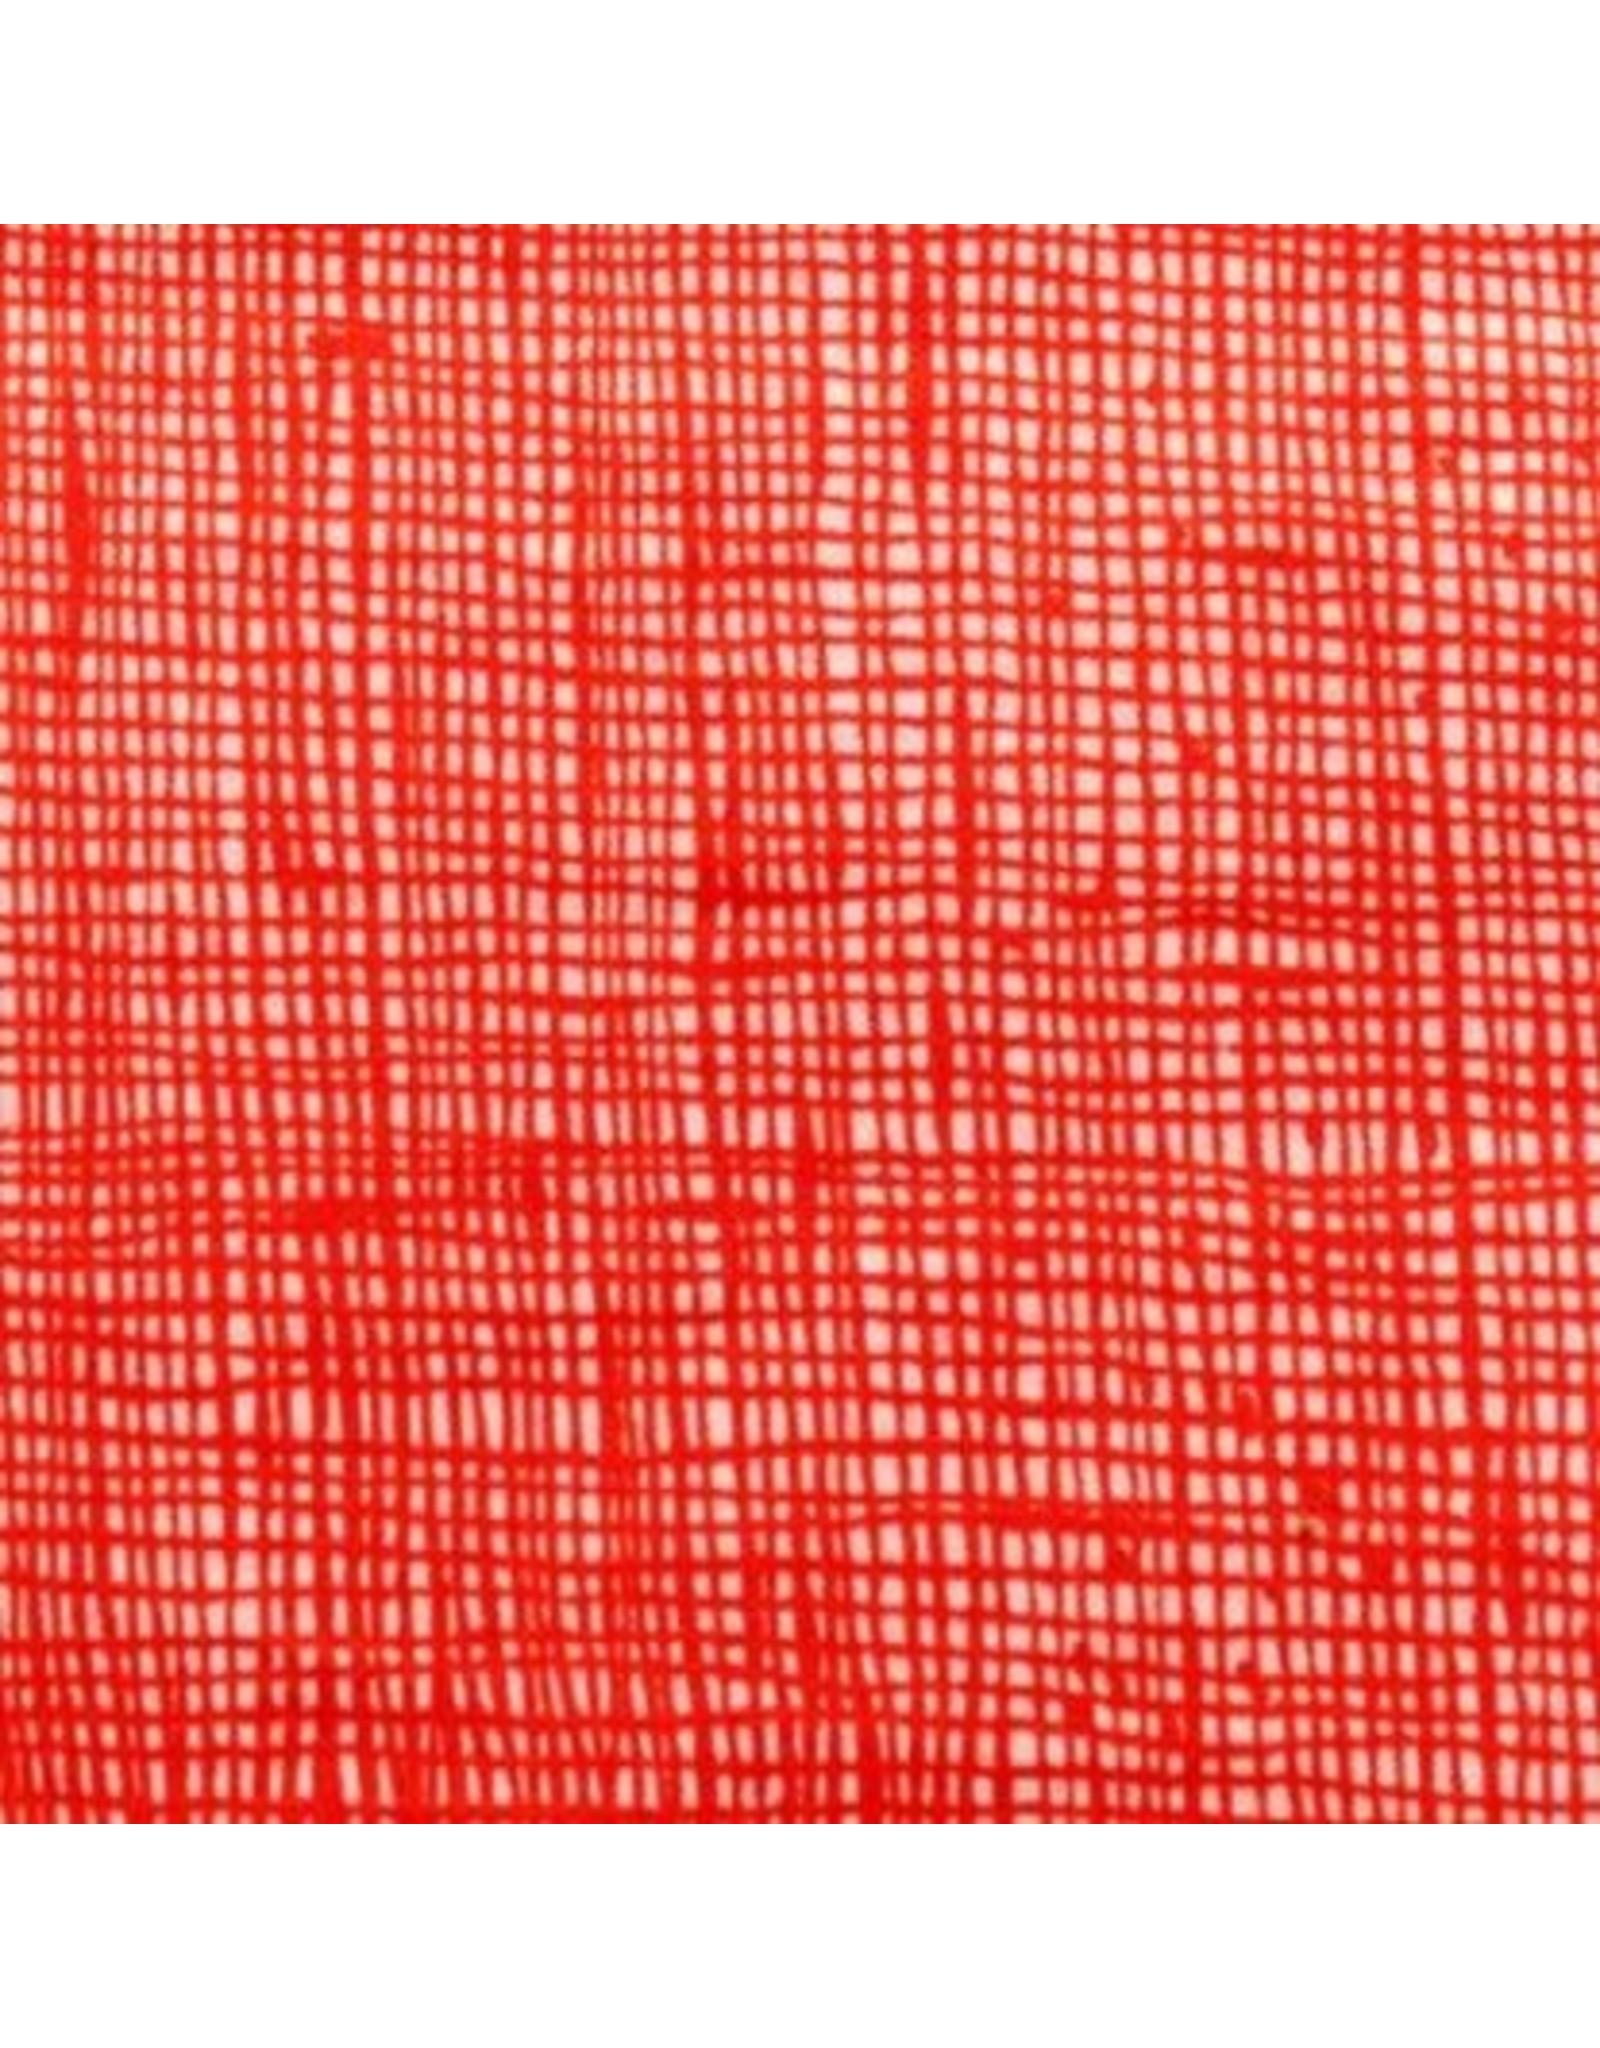 Alexander Henry Fabrics Heath in Natural/Red, Fabric Half-Yards 6883 23